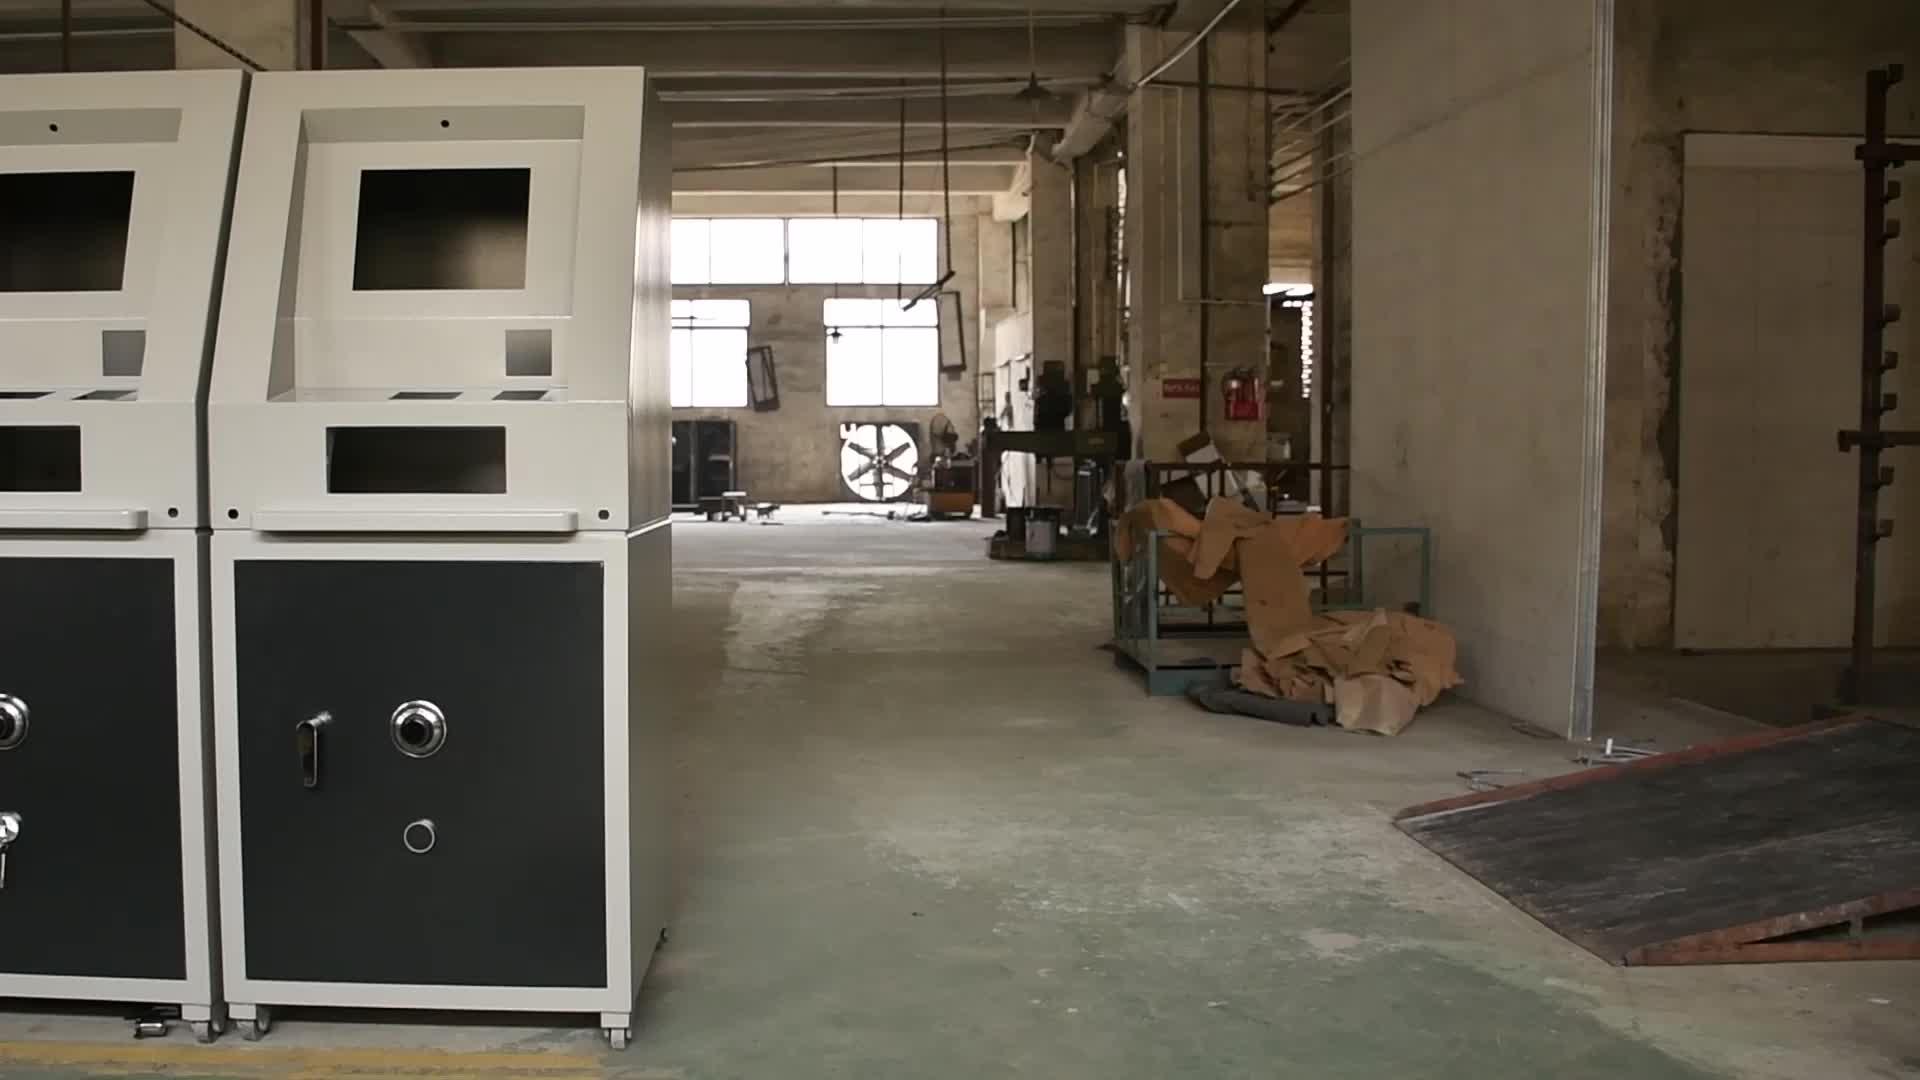 China Supplier Deposit Hidden Key Lock Metal Safe Box - Buy Metal Safe  Box,Key Lock Hotel Safe,Electronic Safe Box Product on Alibaba com